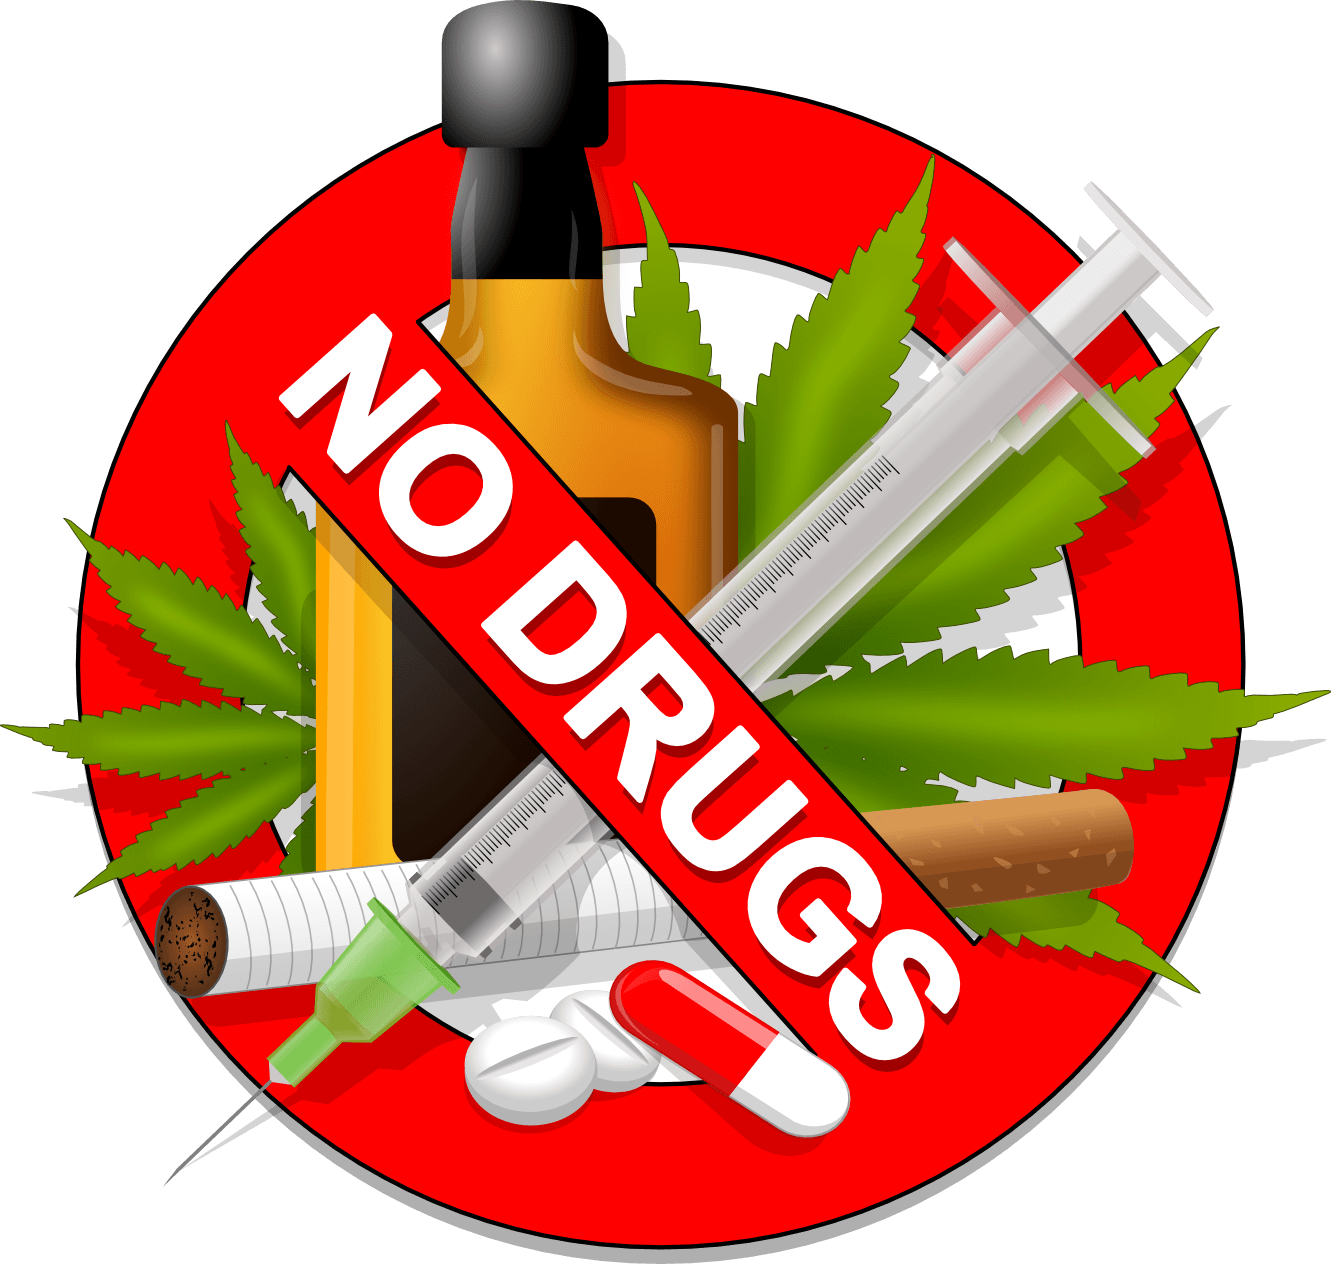 Straf rijden onder invloed van drugs, Straf rijden onder invloed van drugs, DE Advocaat in Verkeersrecht